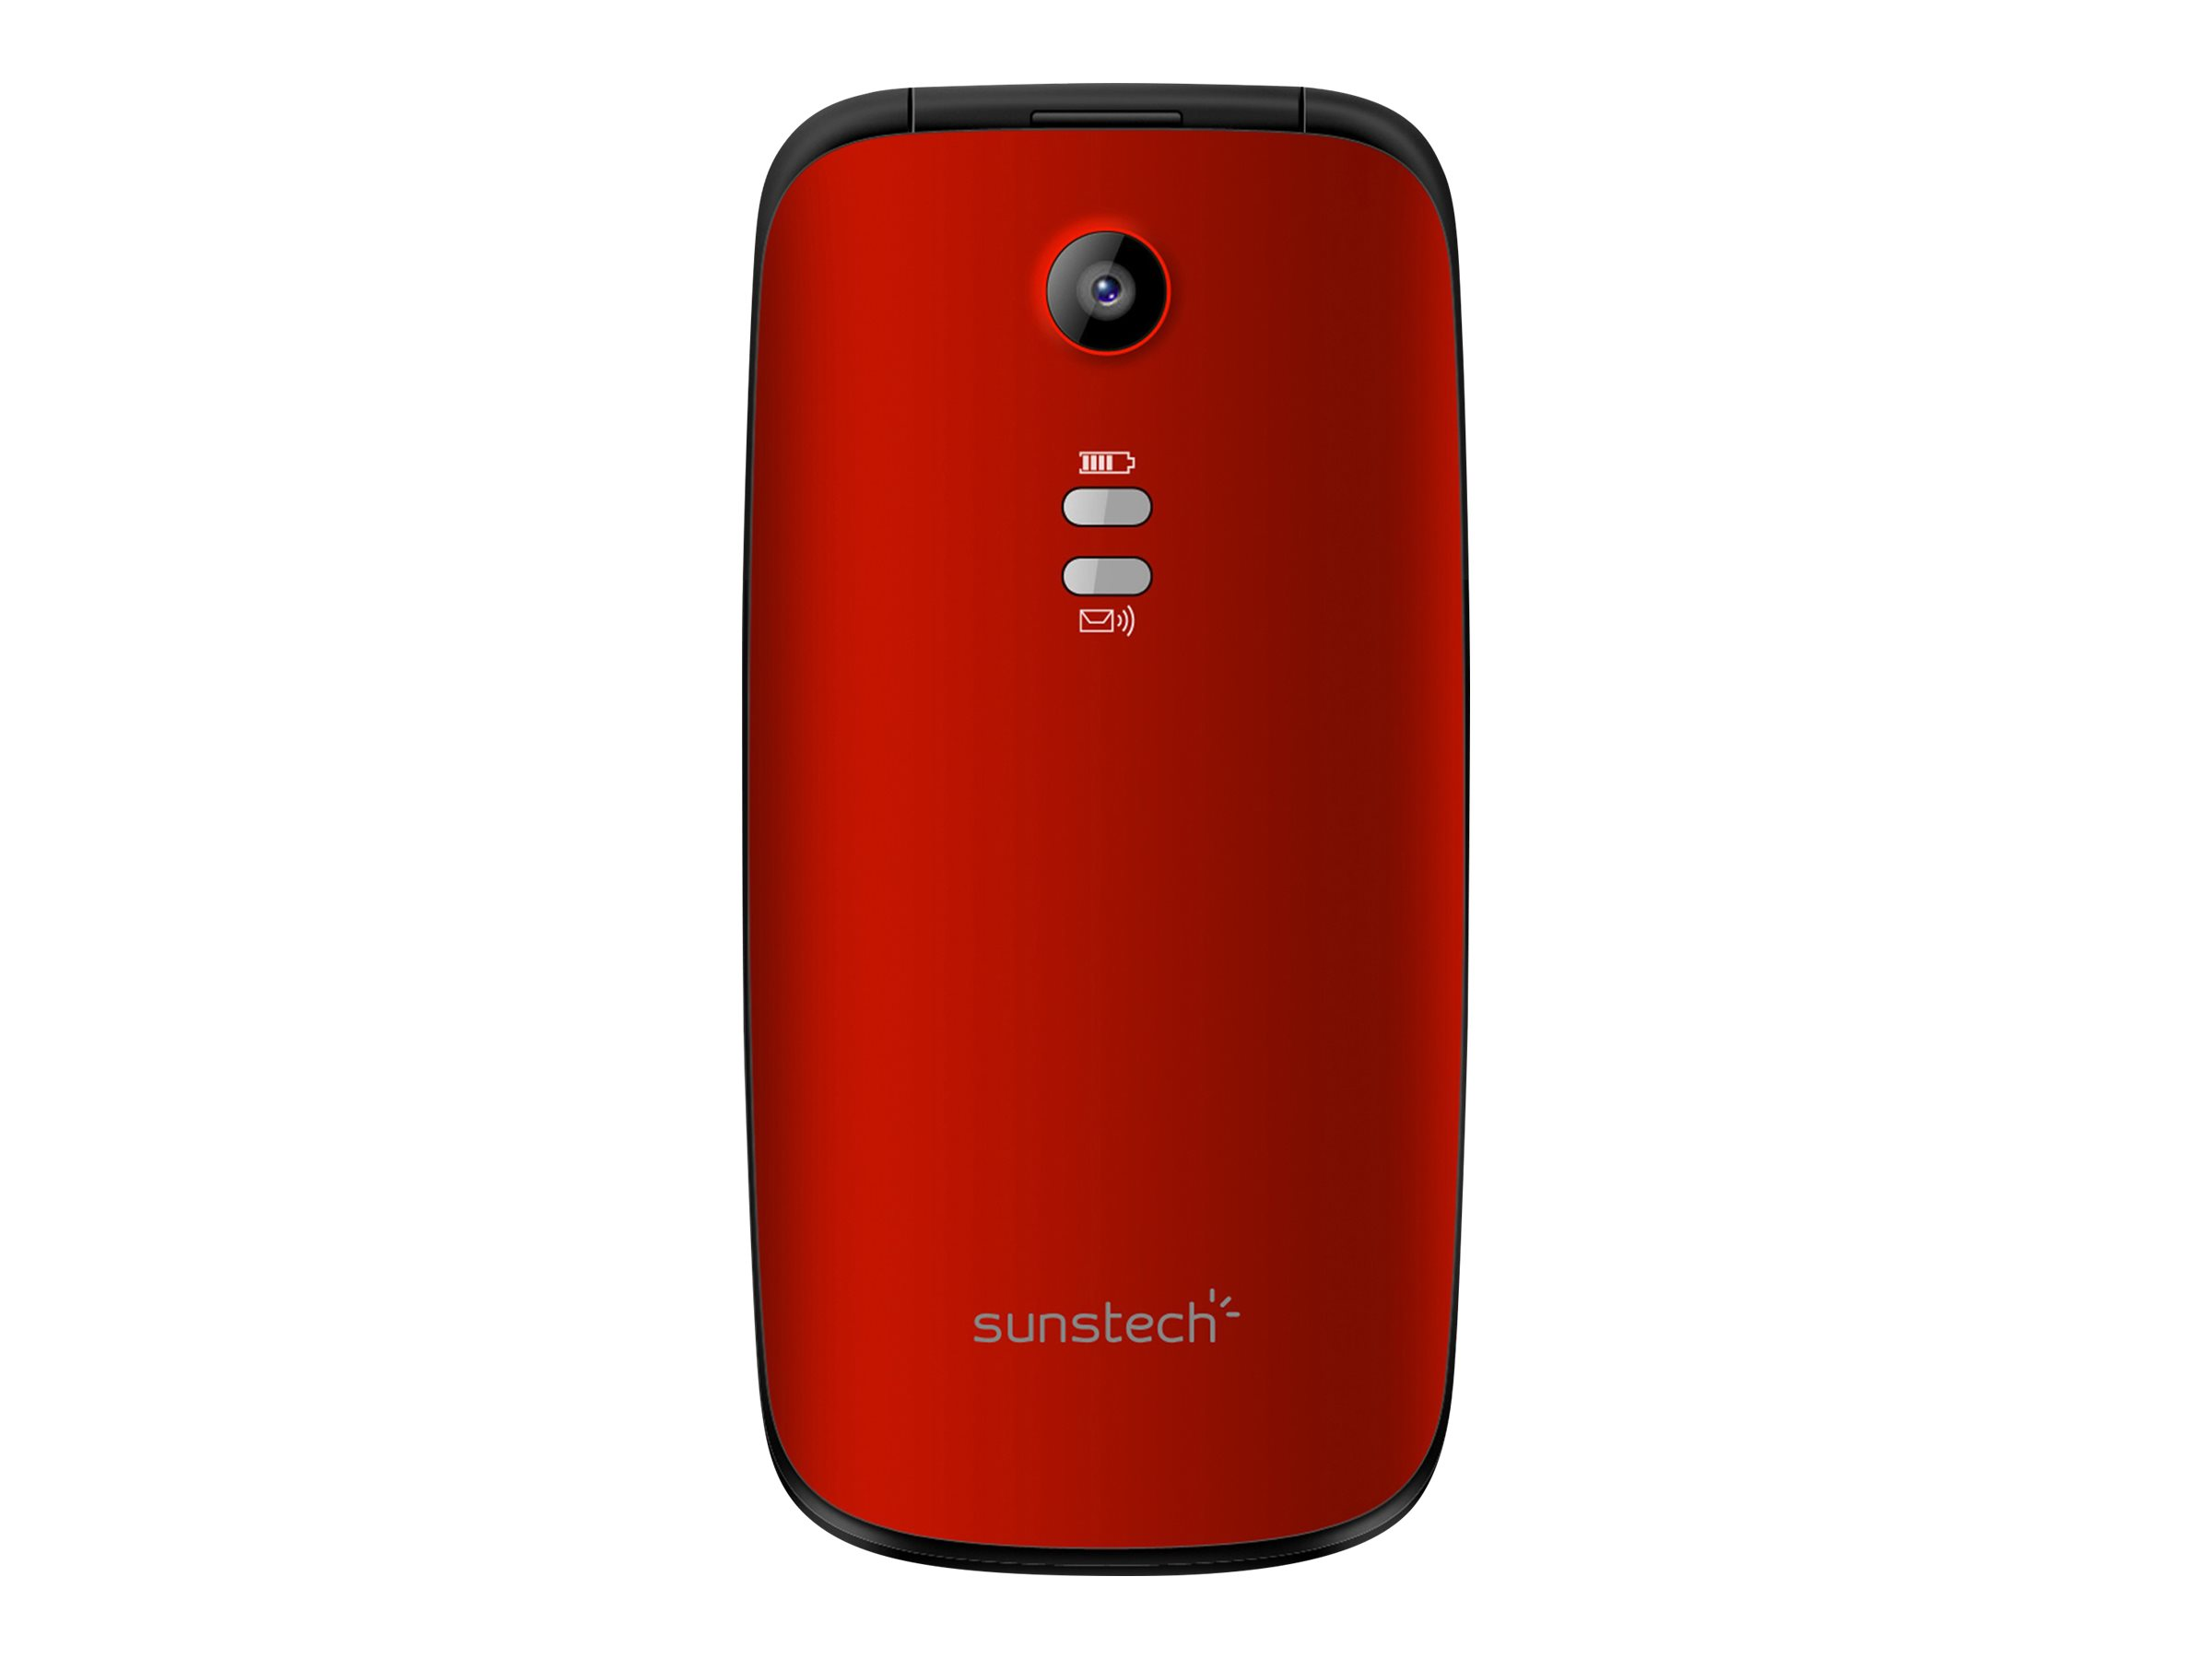 SUNSTECH CELT15 TELEFONO MOVIL MICROSDHC SLOT GSM